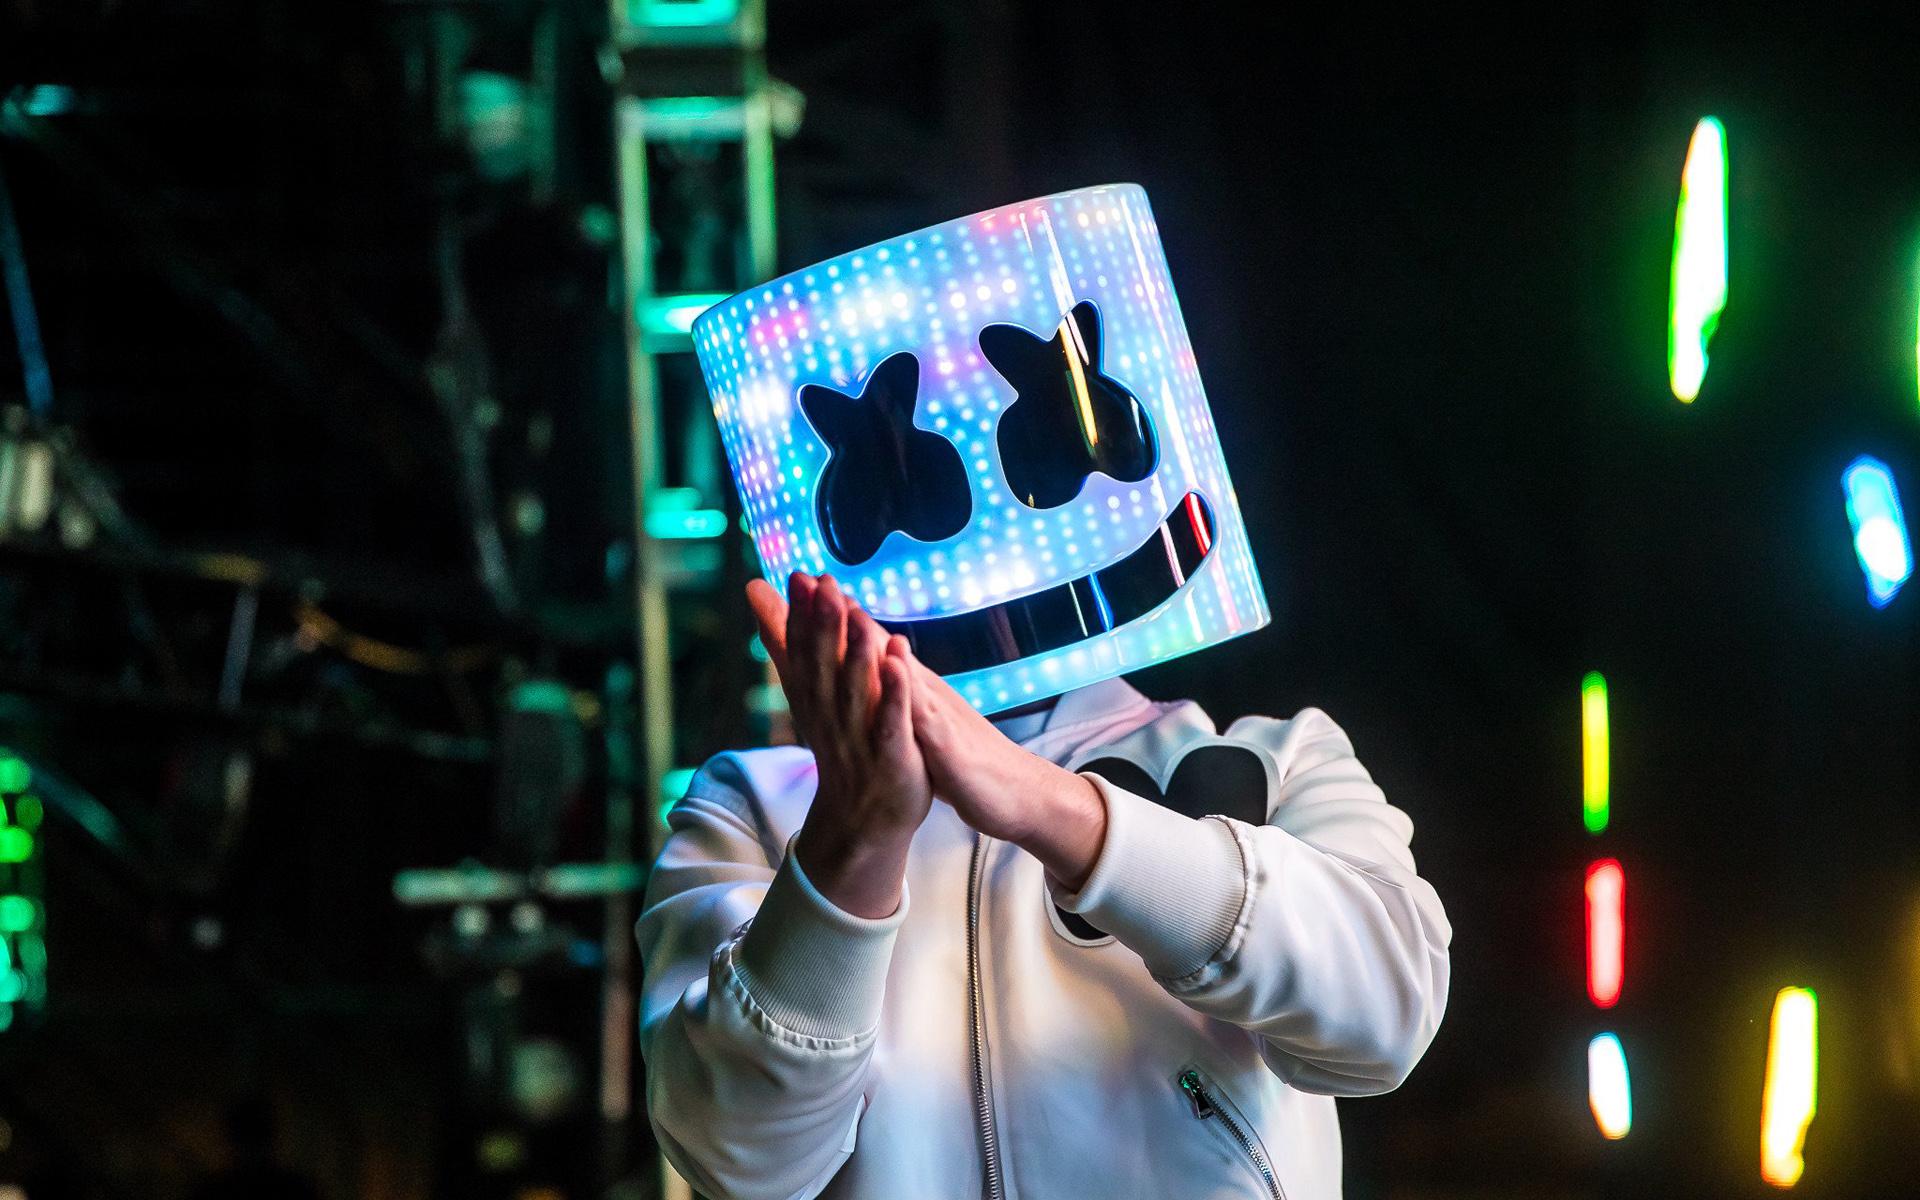 На концерт Marshmello в Fortnite пришло более 10 млн игроков